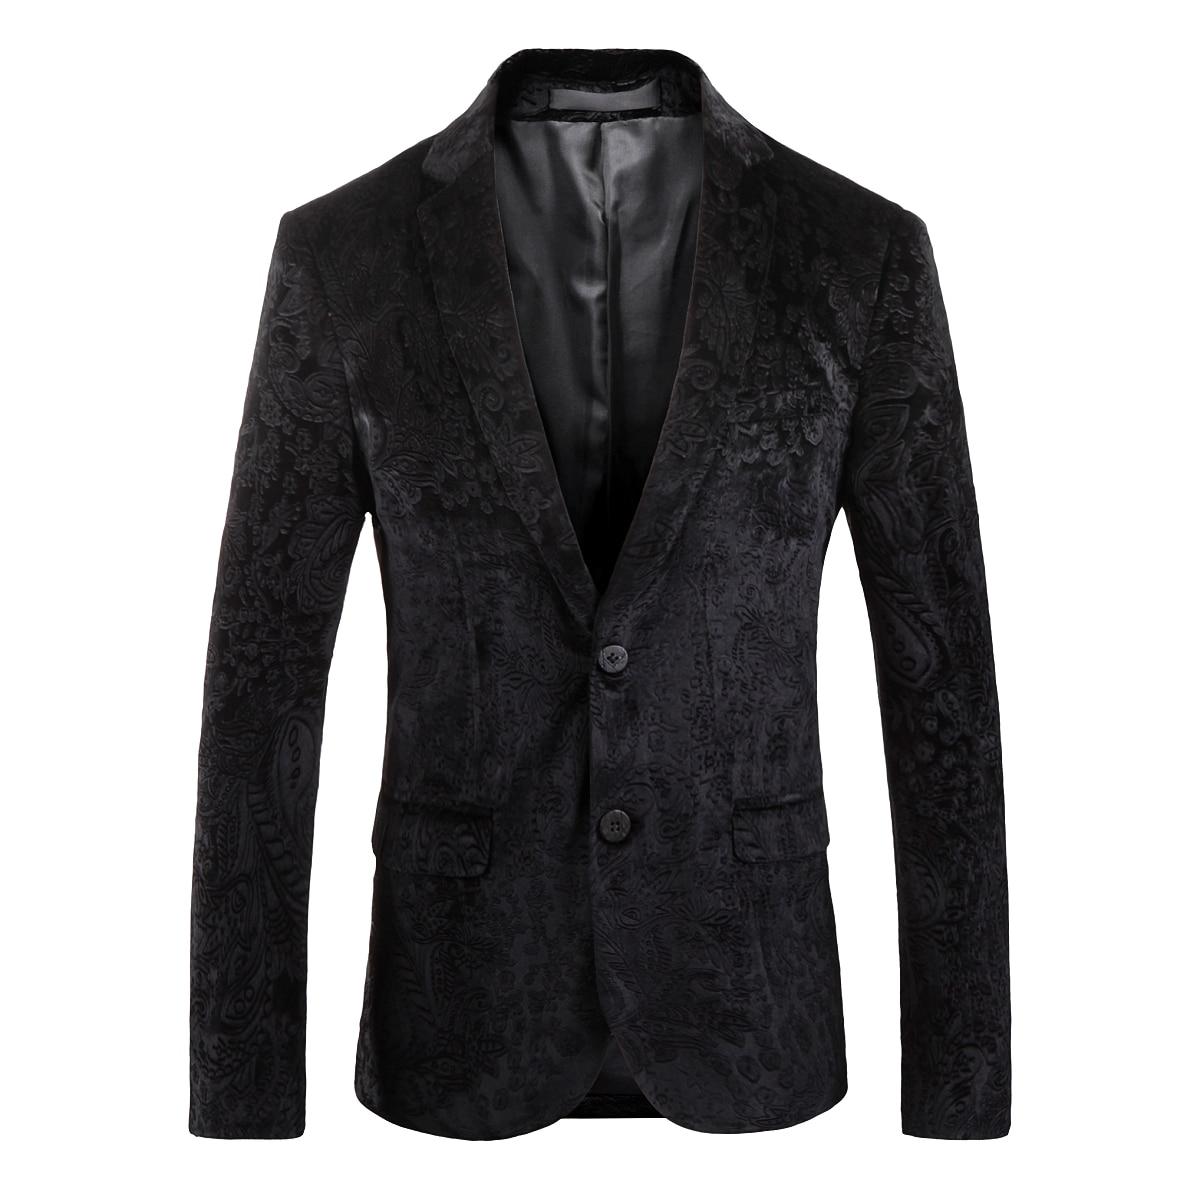 PAULKONTE 2019 New Men Pattern Suit Dress Jacket Black Business Family Dinner High Quality Self Cultivation Temperament Clothing